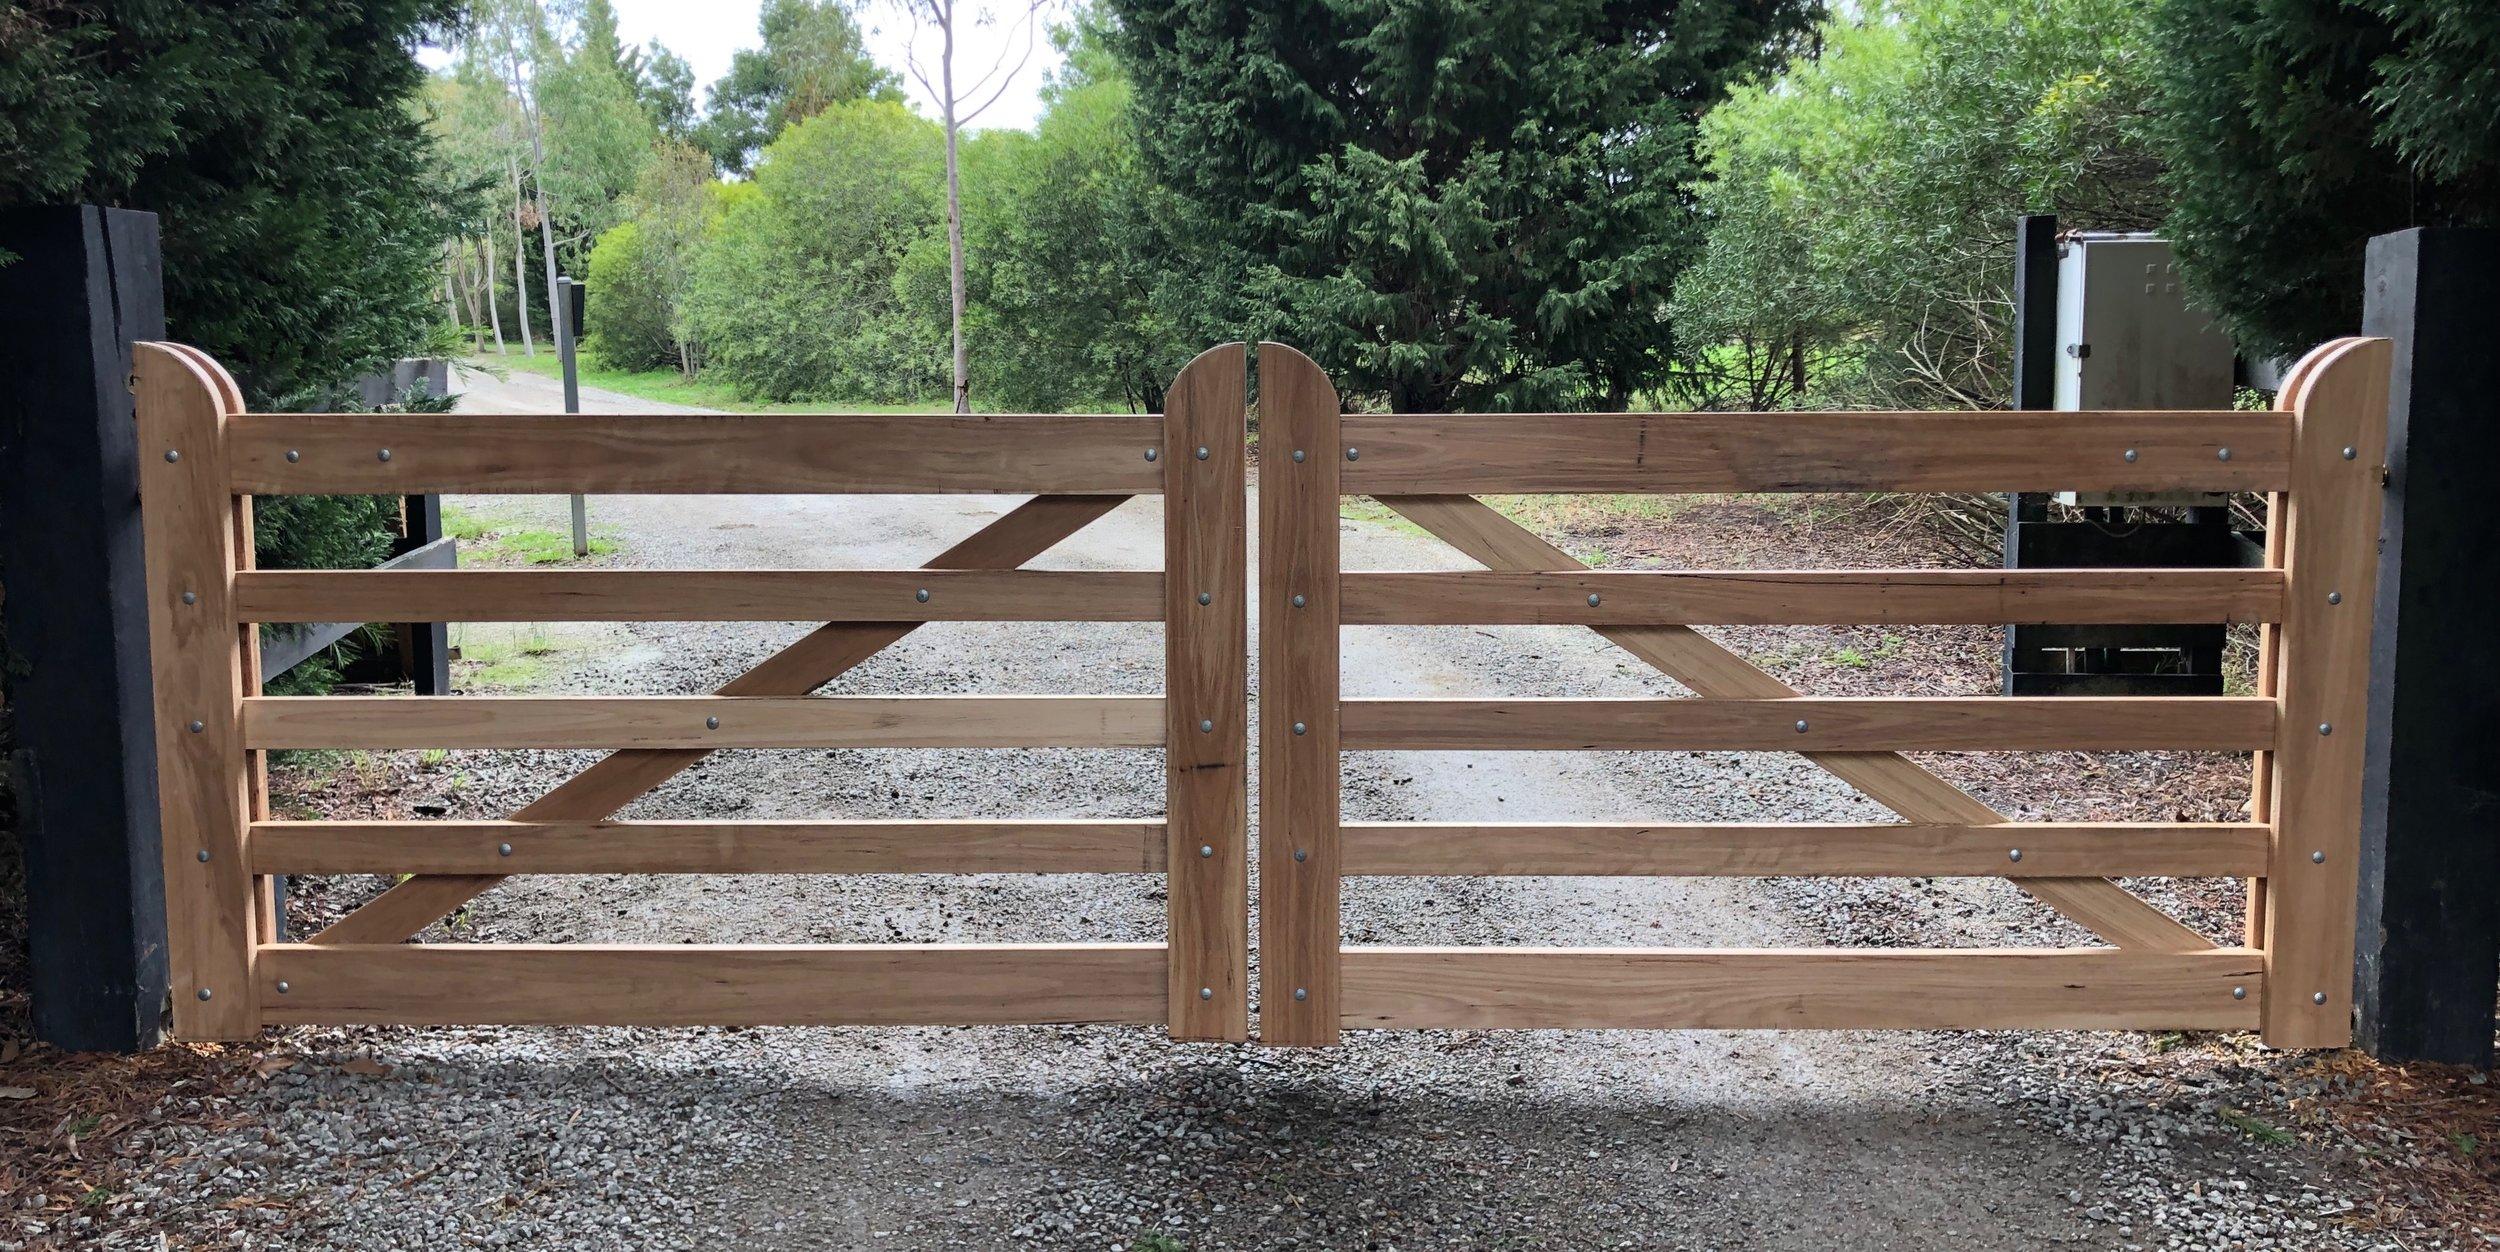 Wareham Double Gates.jpg Peninsula Timber Gates.jpg